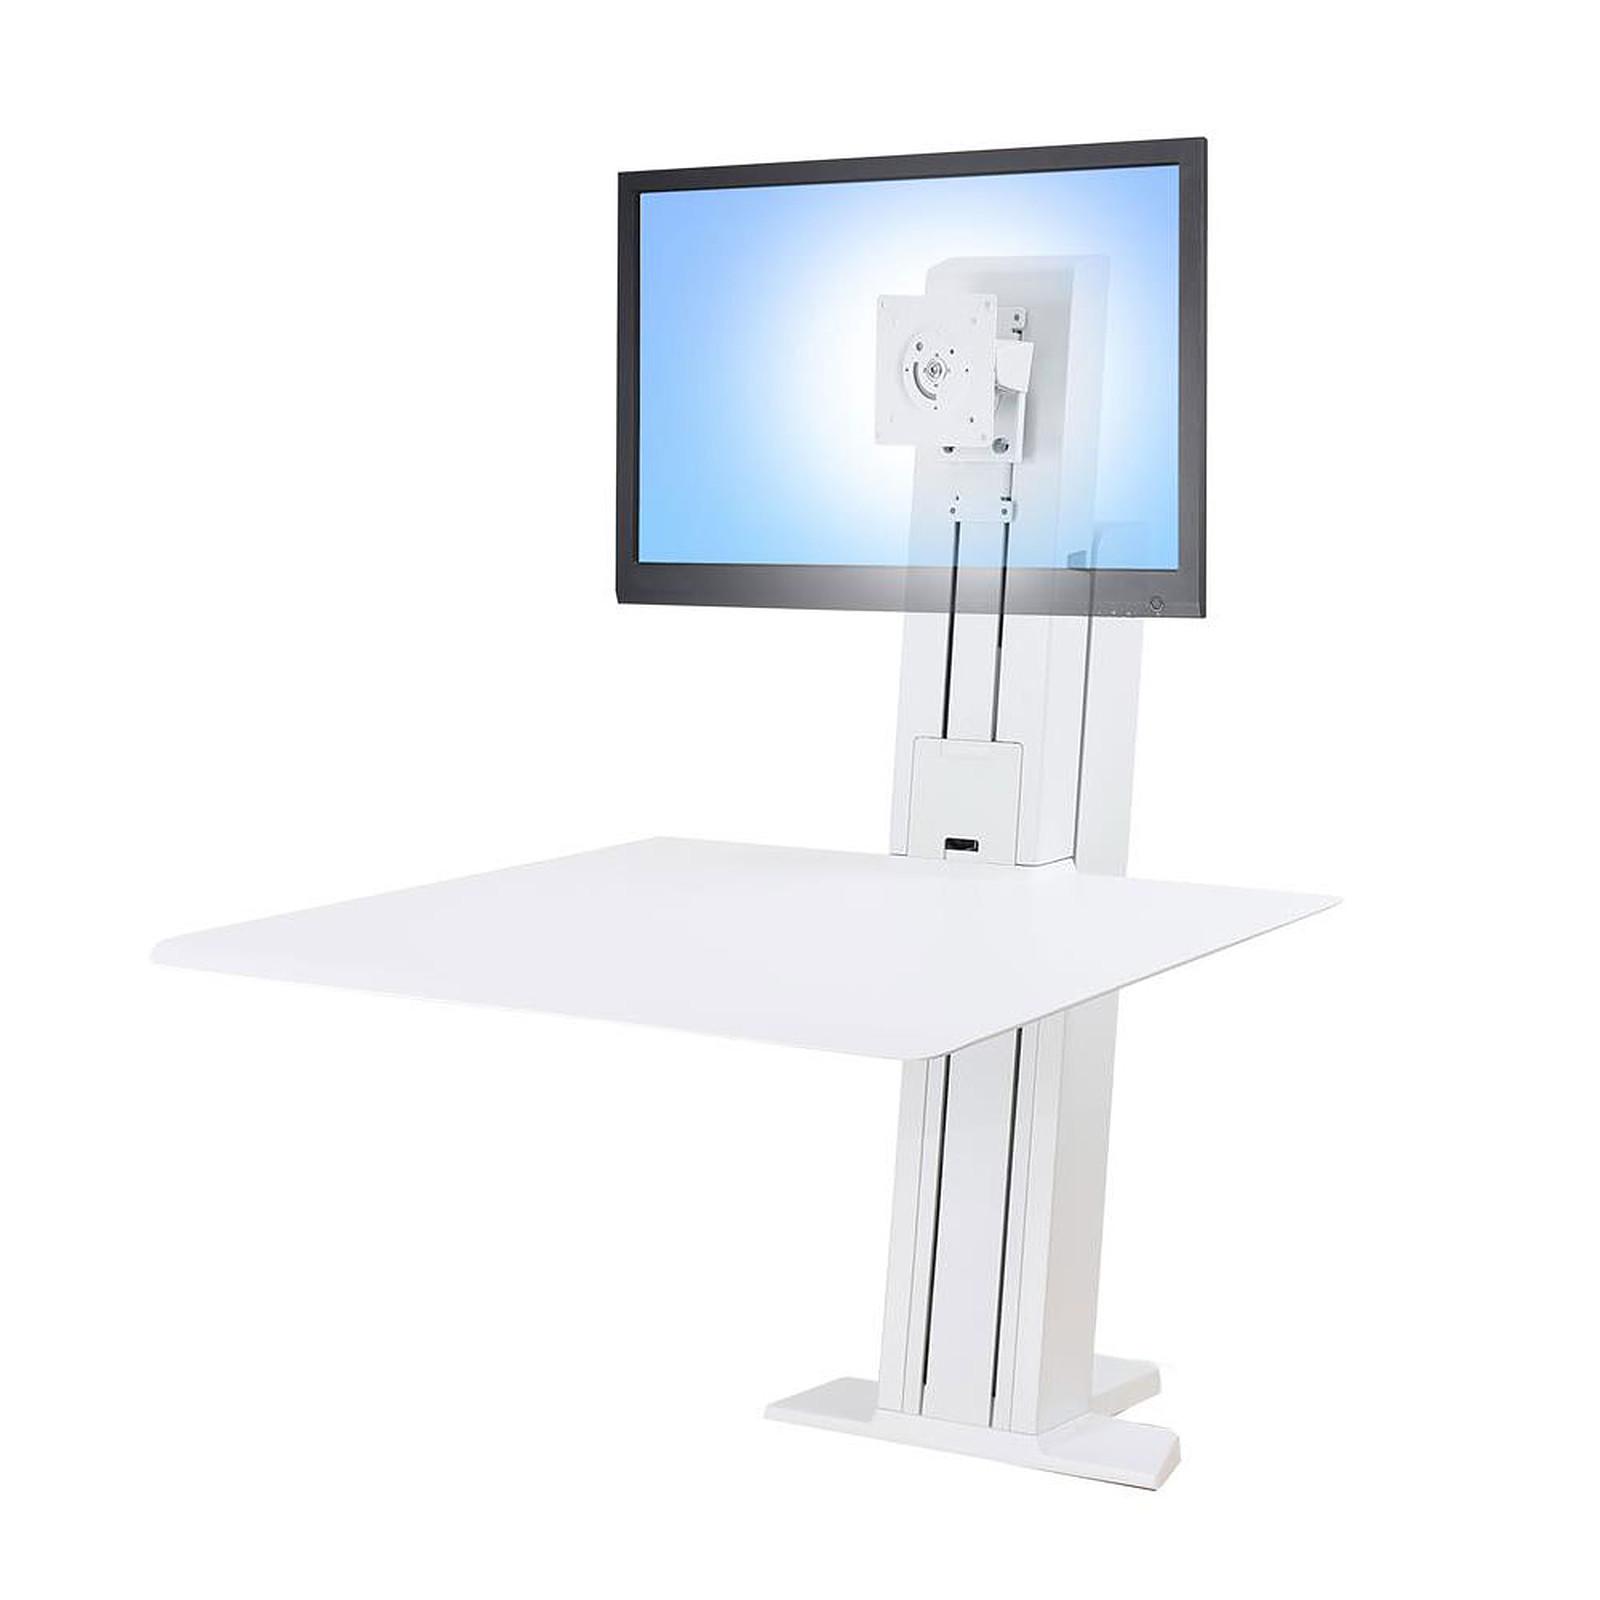 Ergotron WorkFit-SR Mono-écran (Blanc)